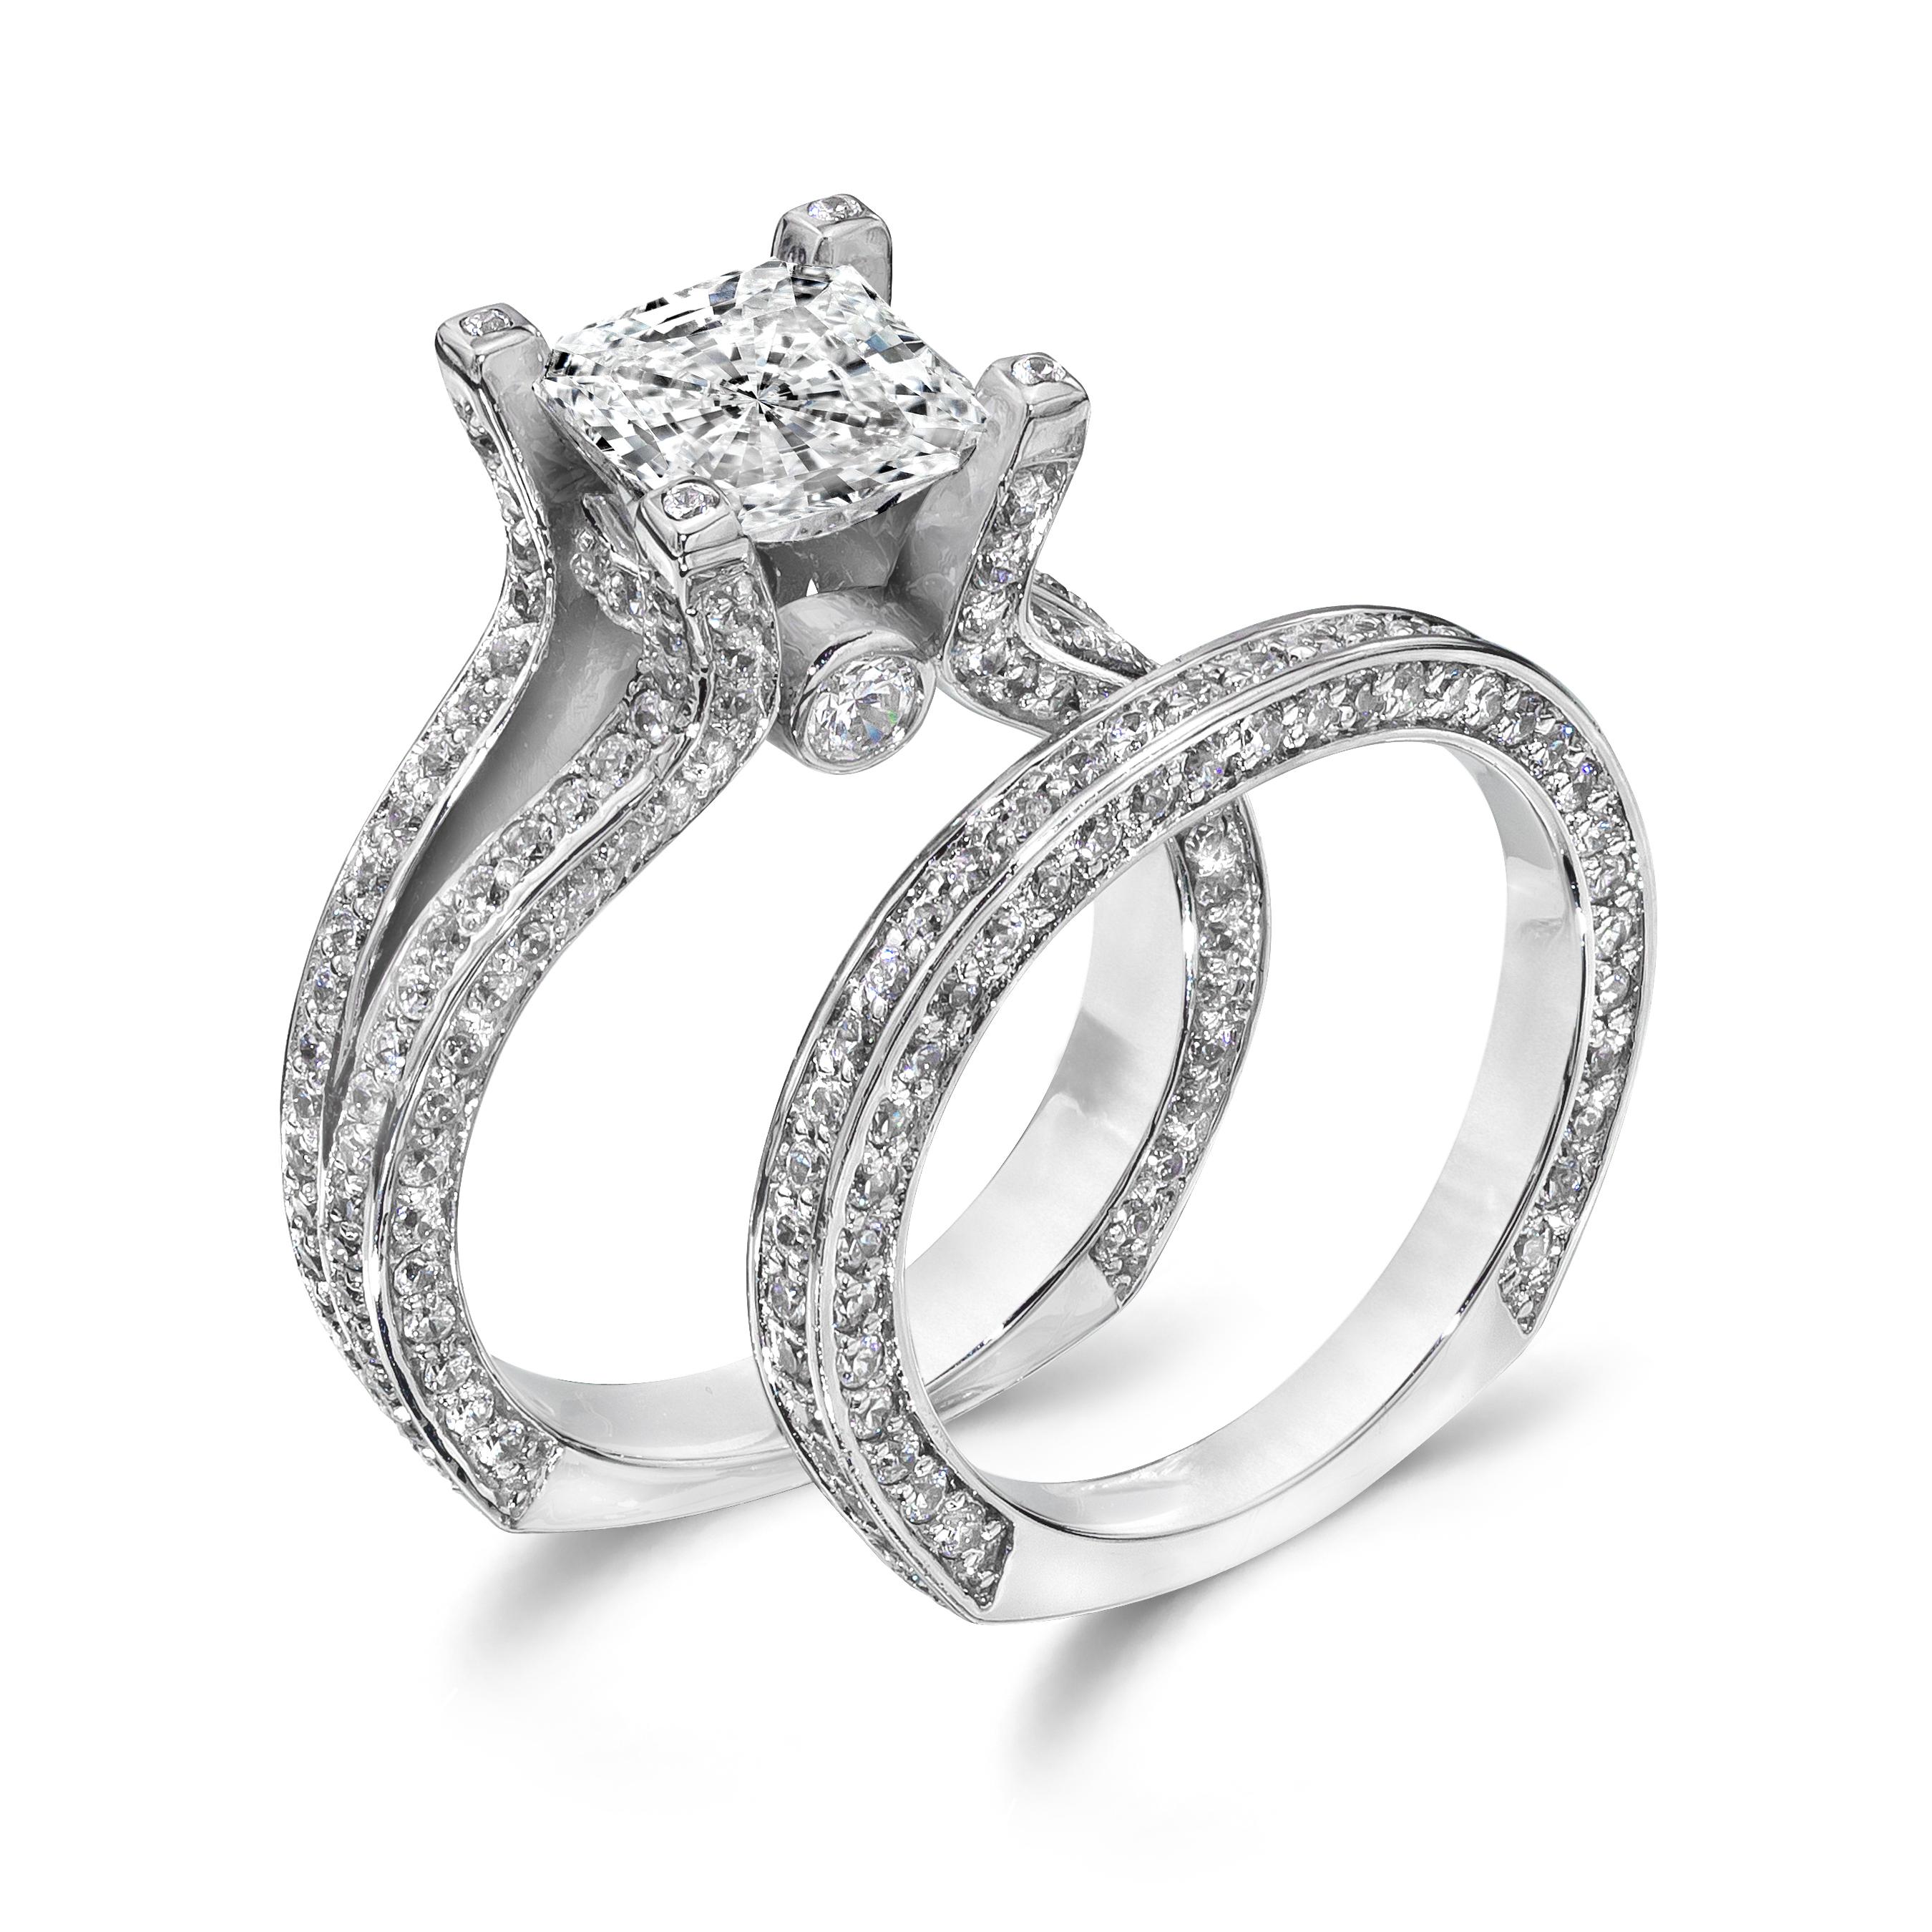 a closer look at our princess cut 2 0 carat cz wedding ring set cz wedding band